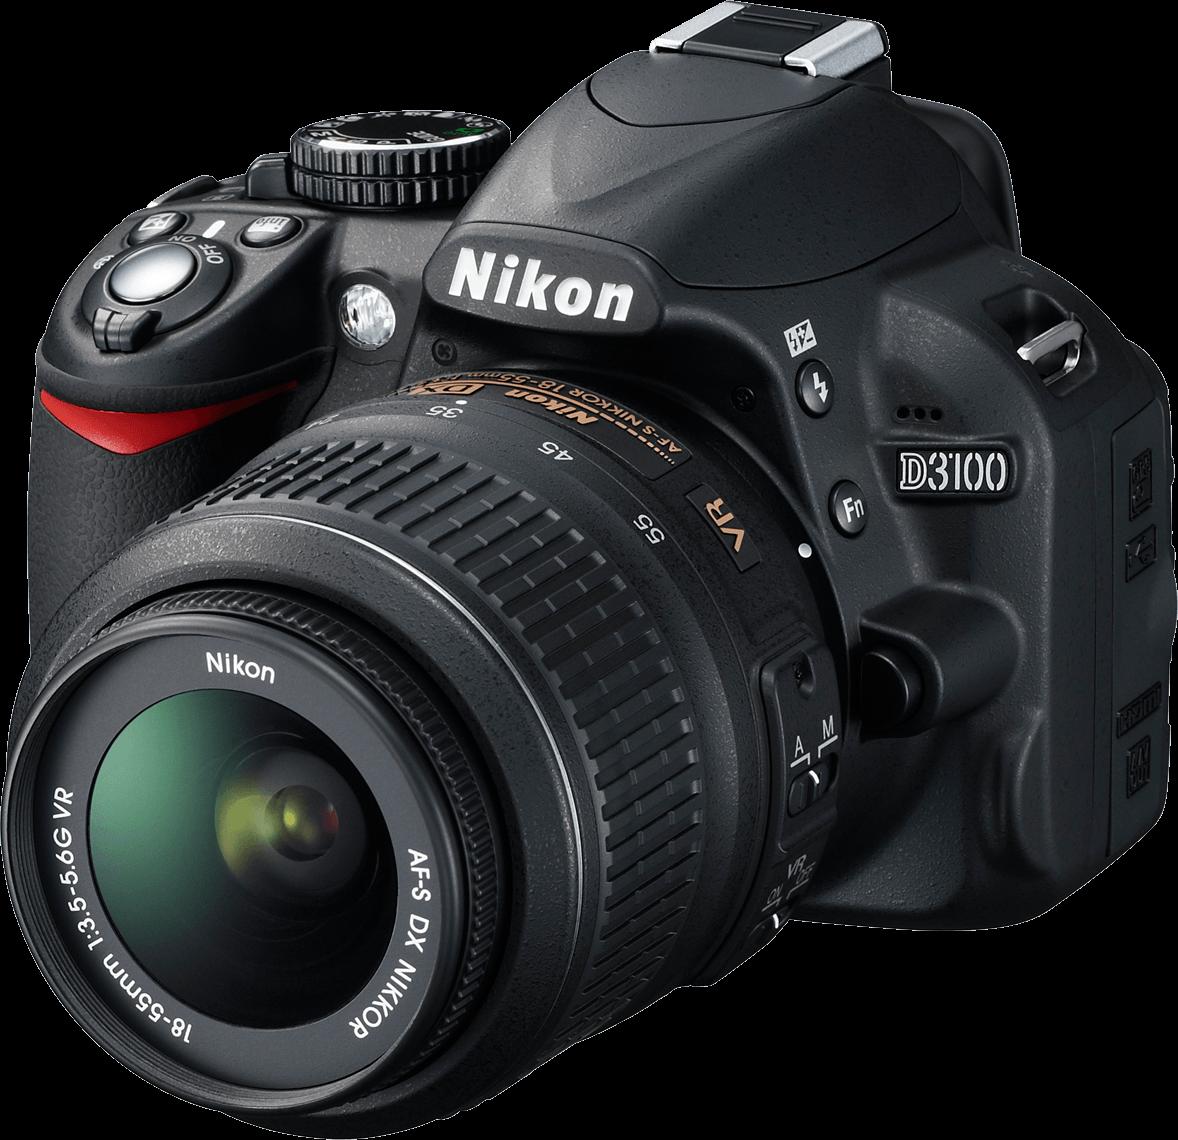 Nikon D 3100 Photo Camera - Vintage Camera PNG Nikon